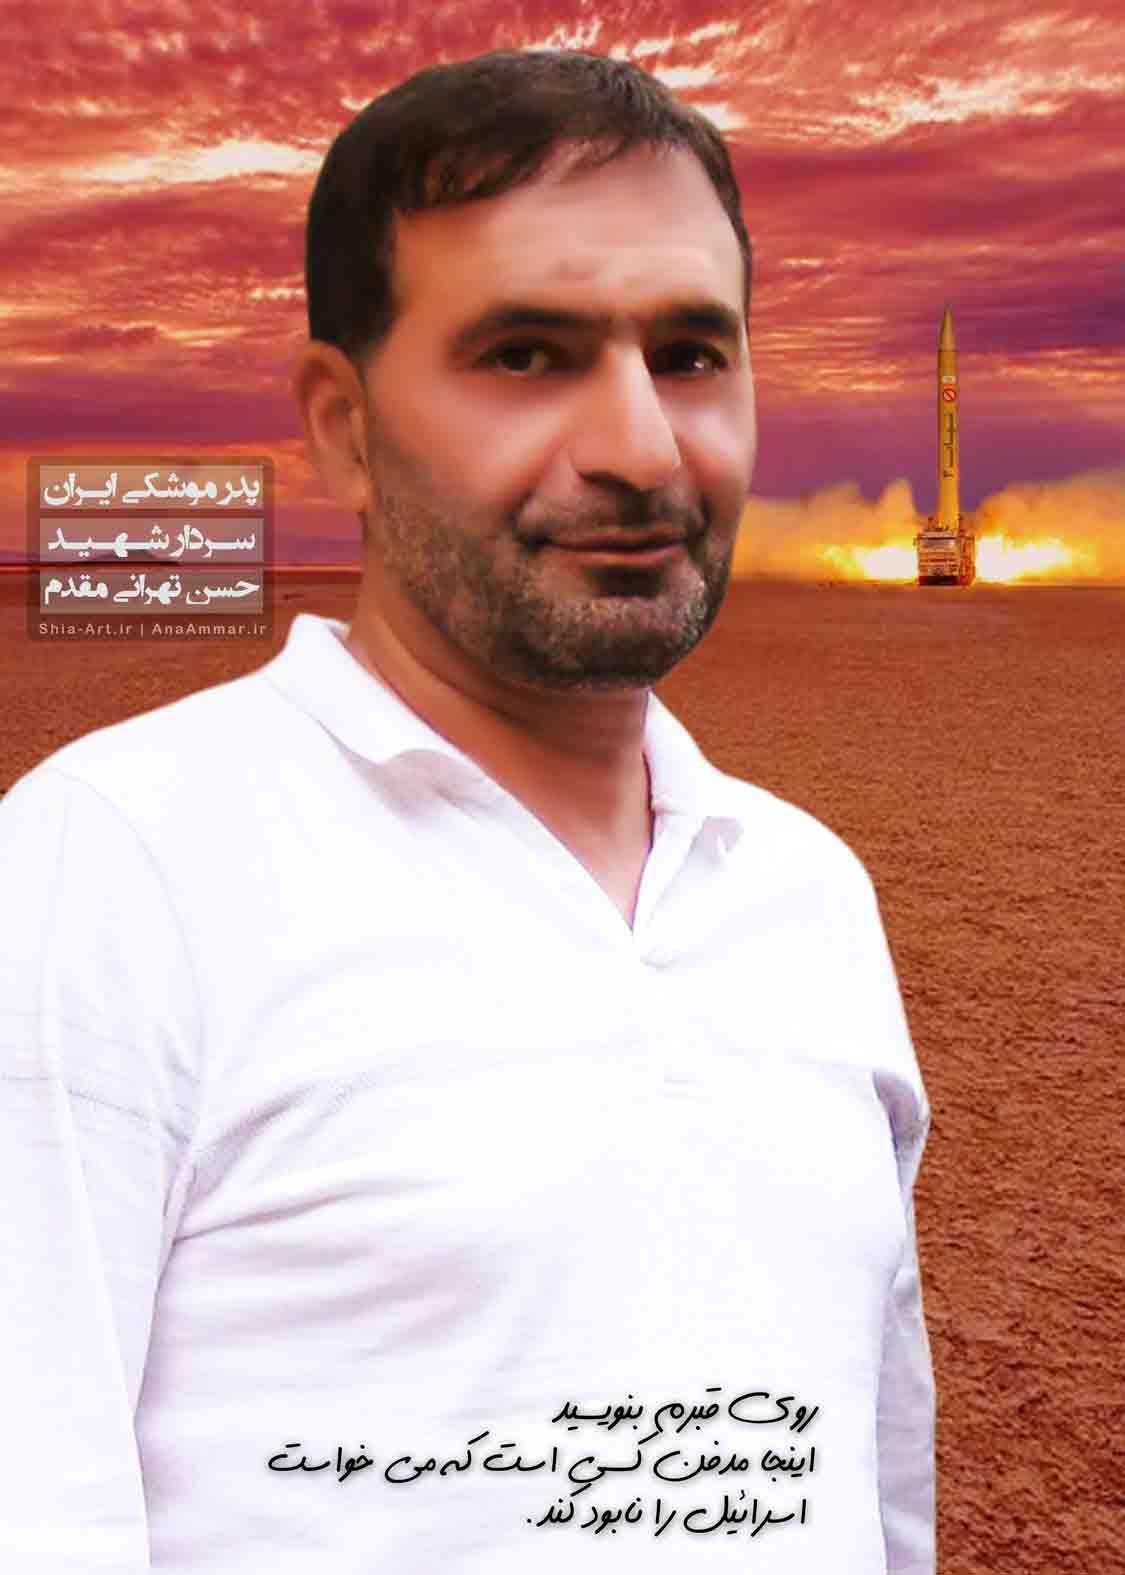 سردار سرلشگر شهید حاج حسن تهرانی مقدم